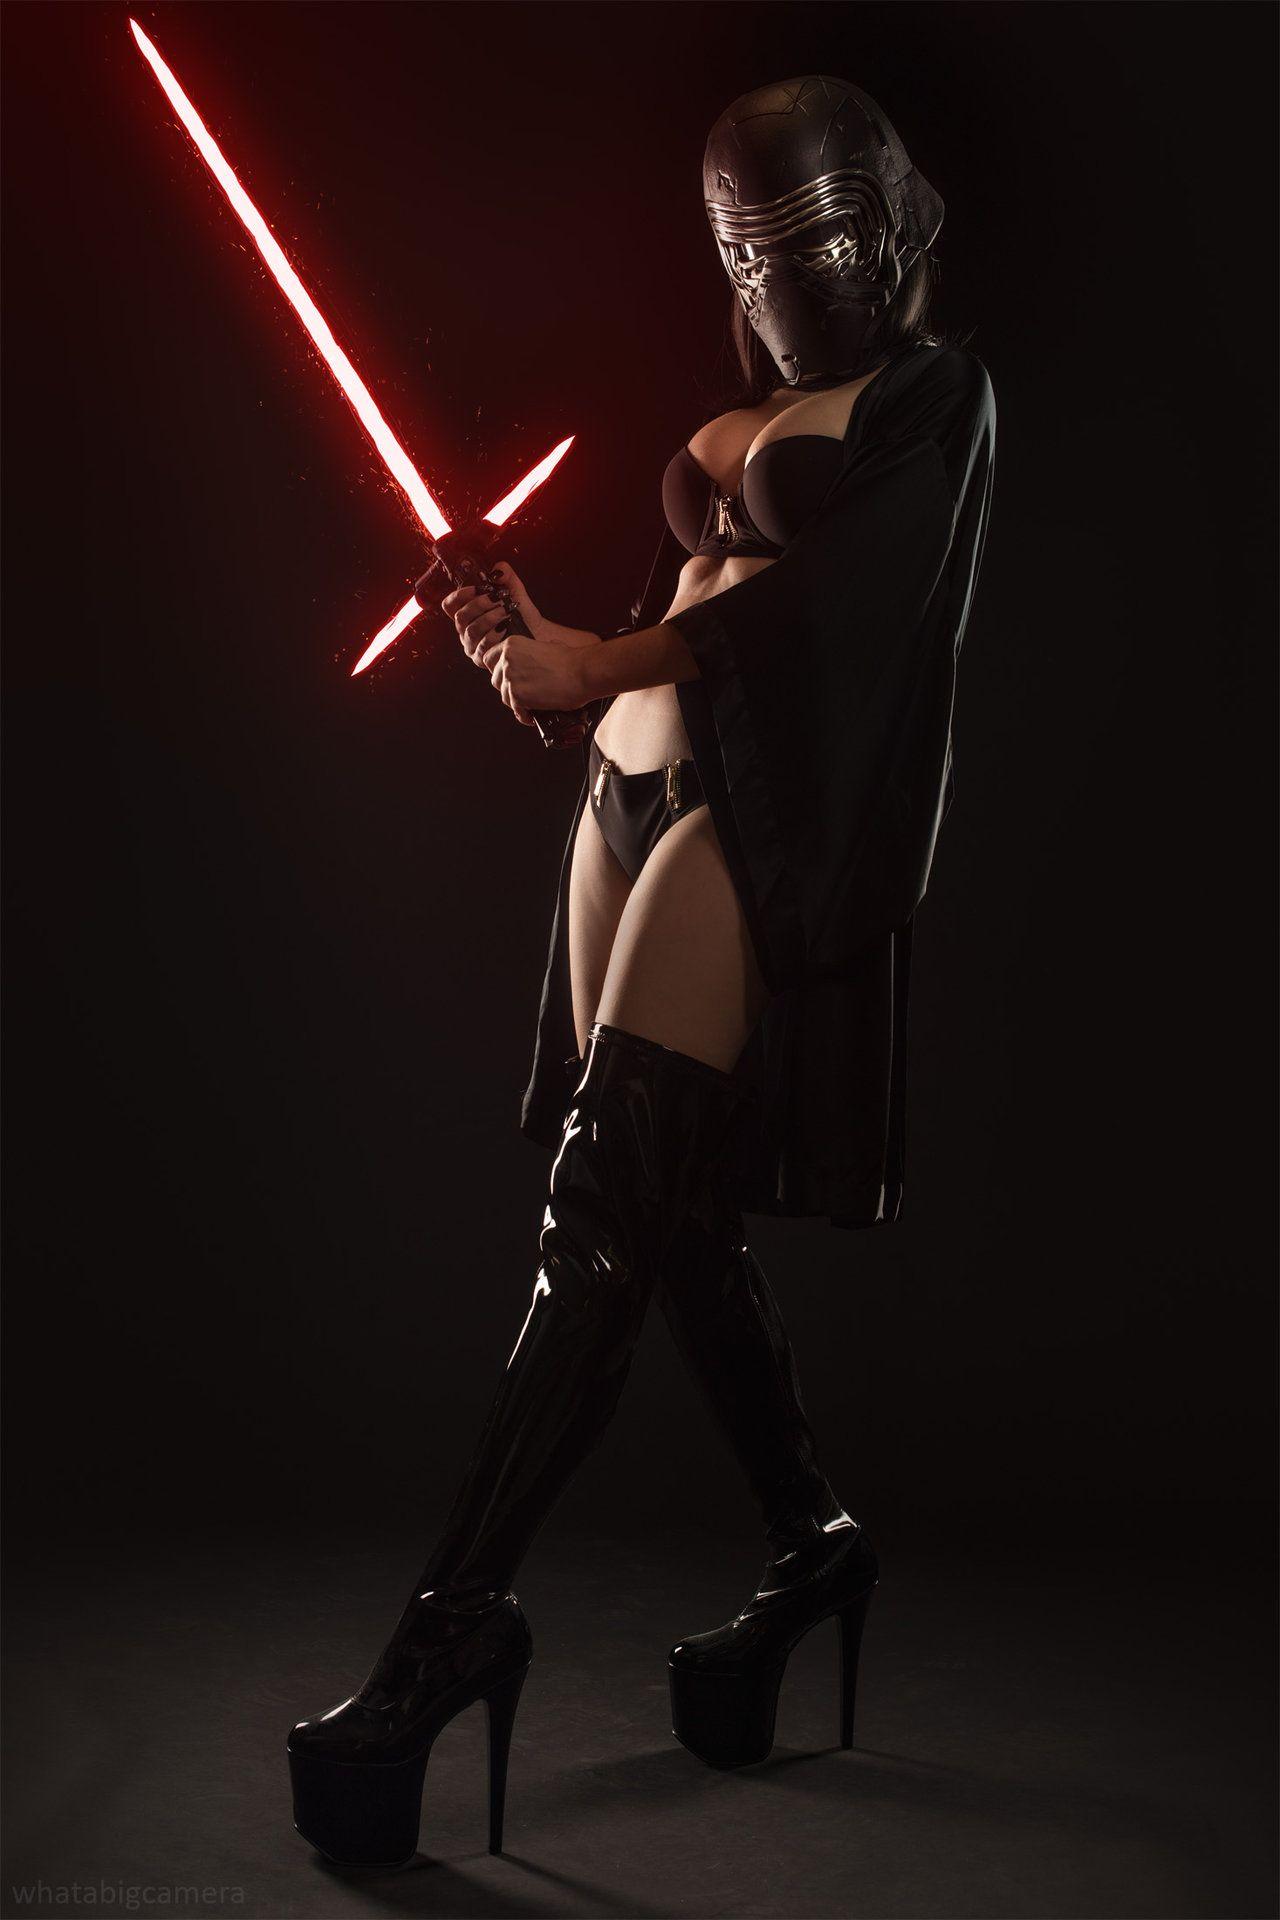 Sexy star wars women princess leia cosplay bra top dress bikini slave costume